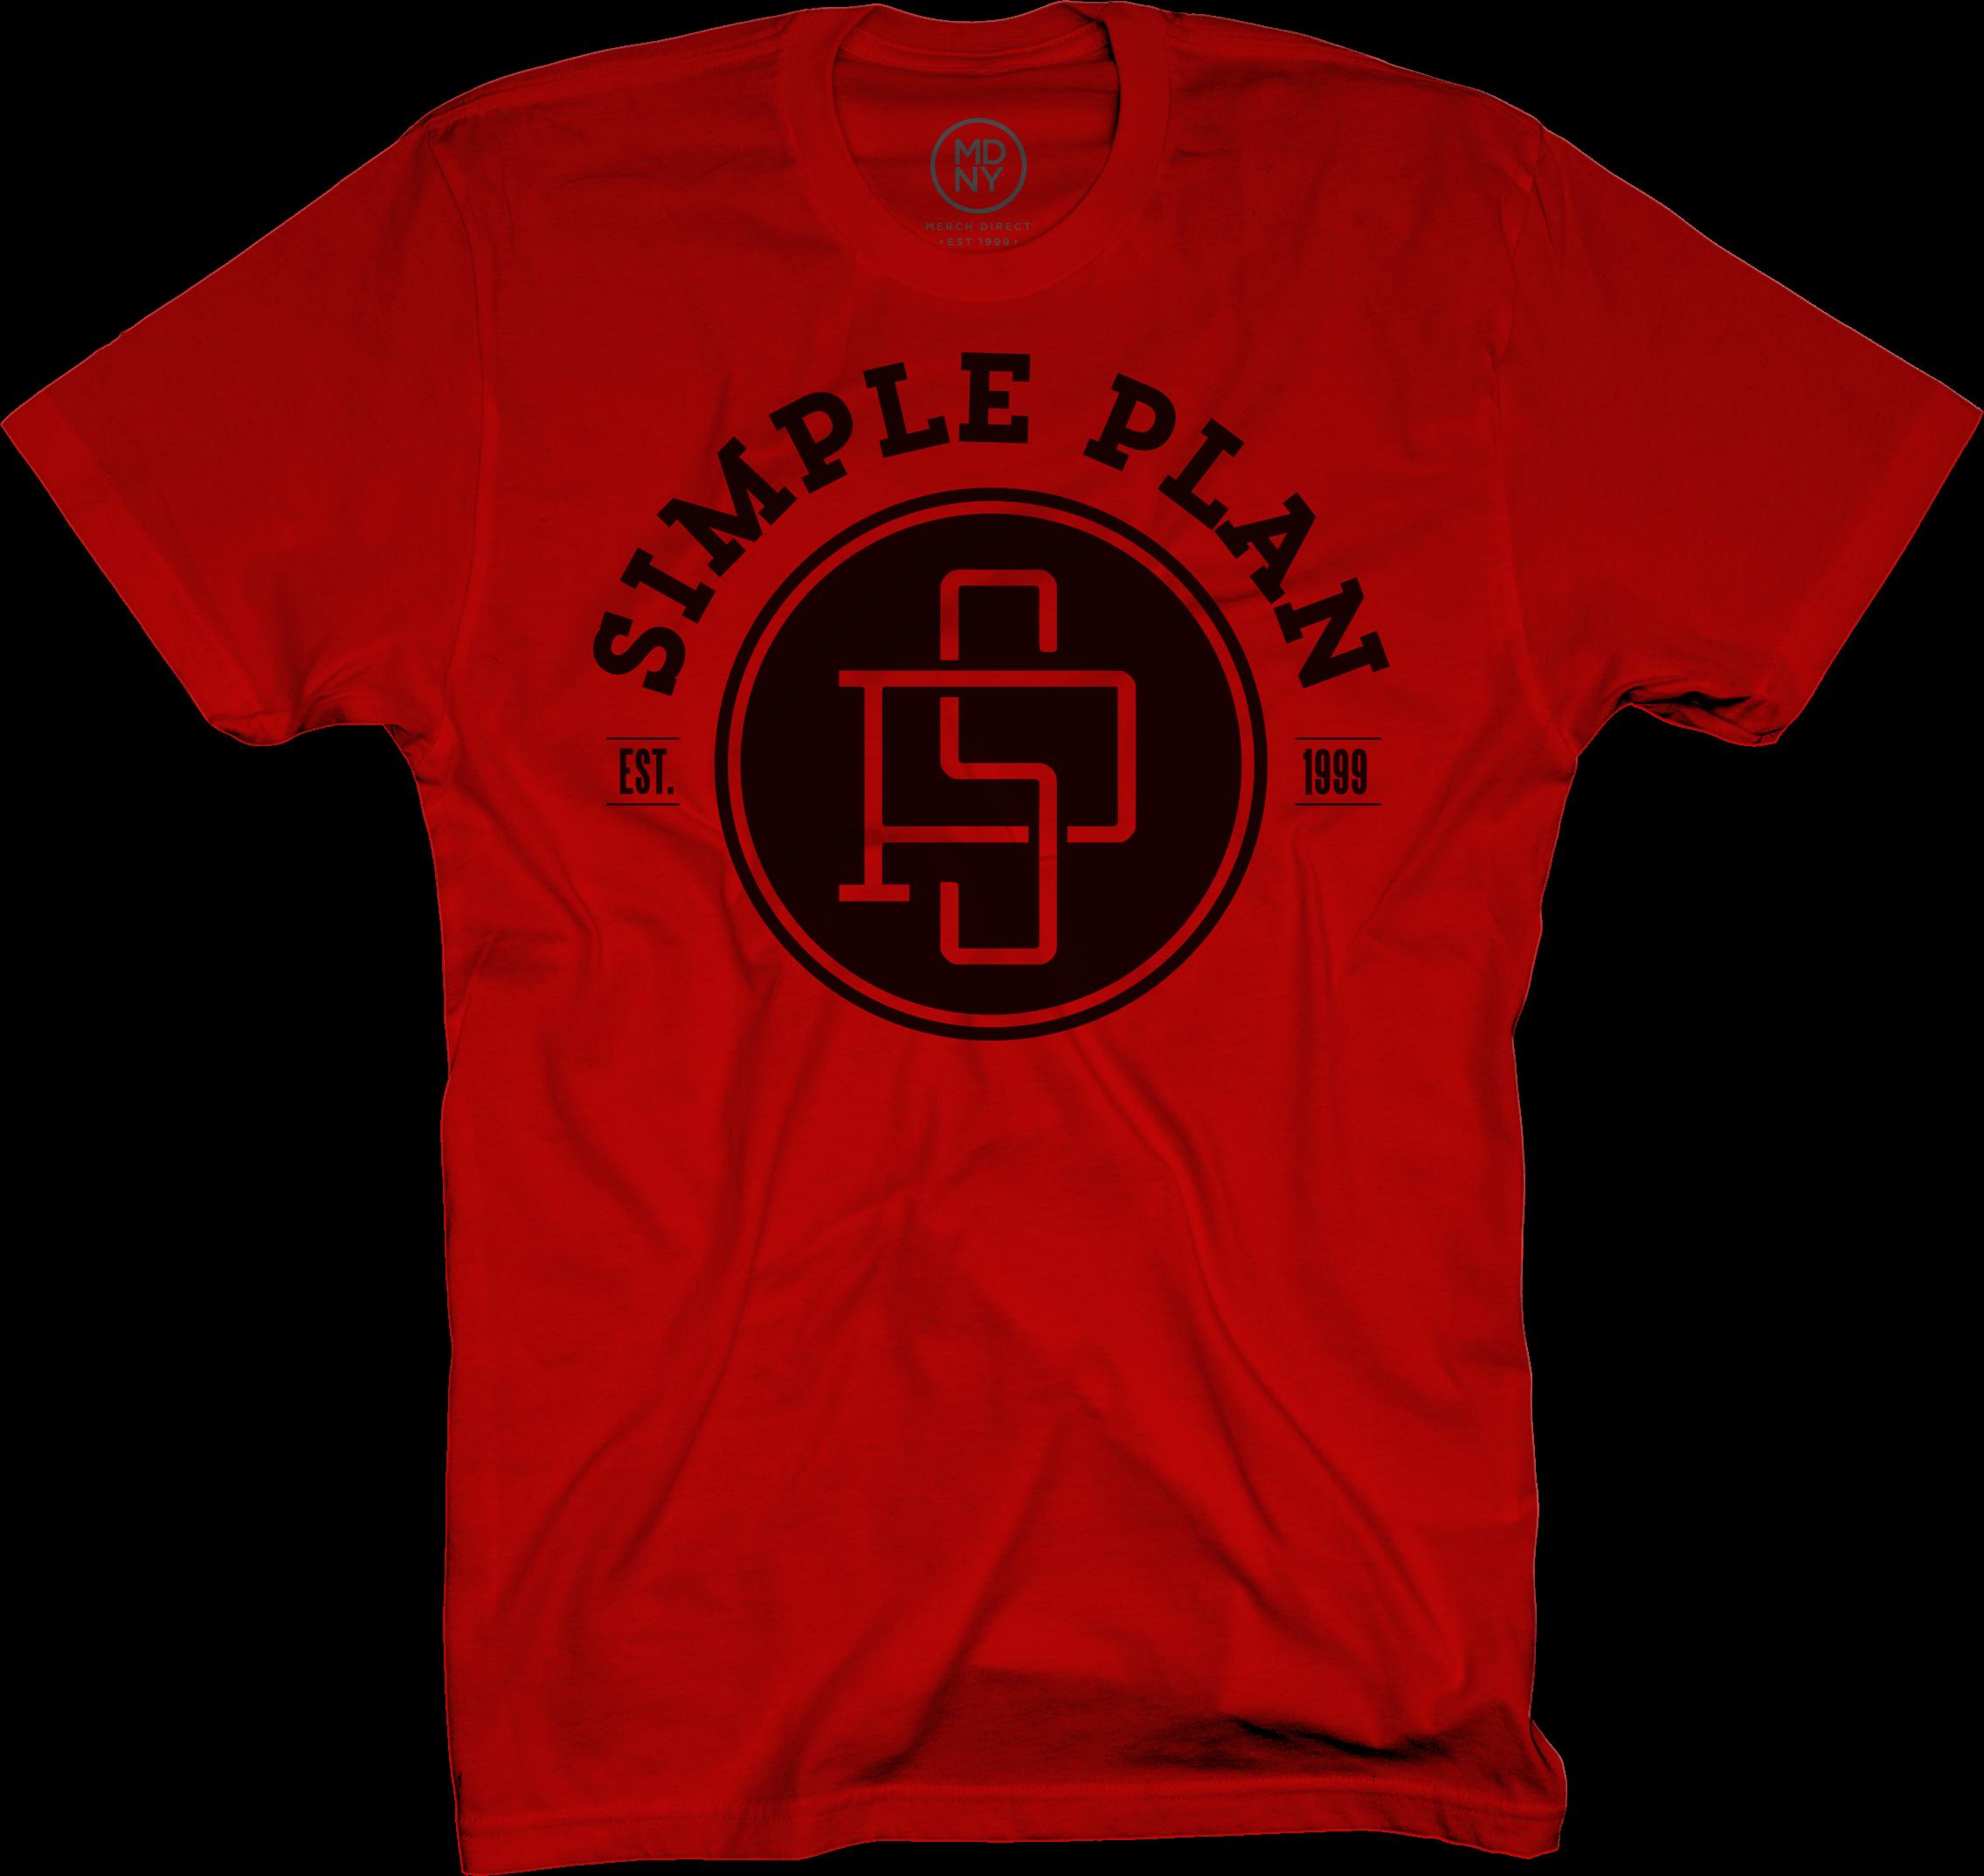 15th Anniversary Tour T-Shirt